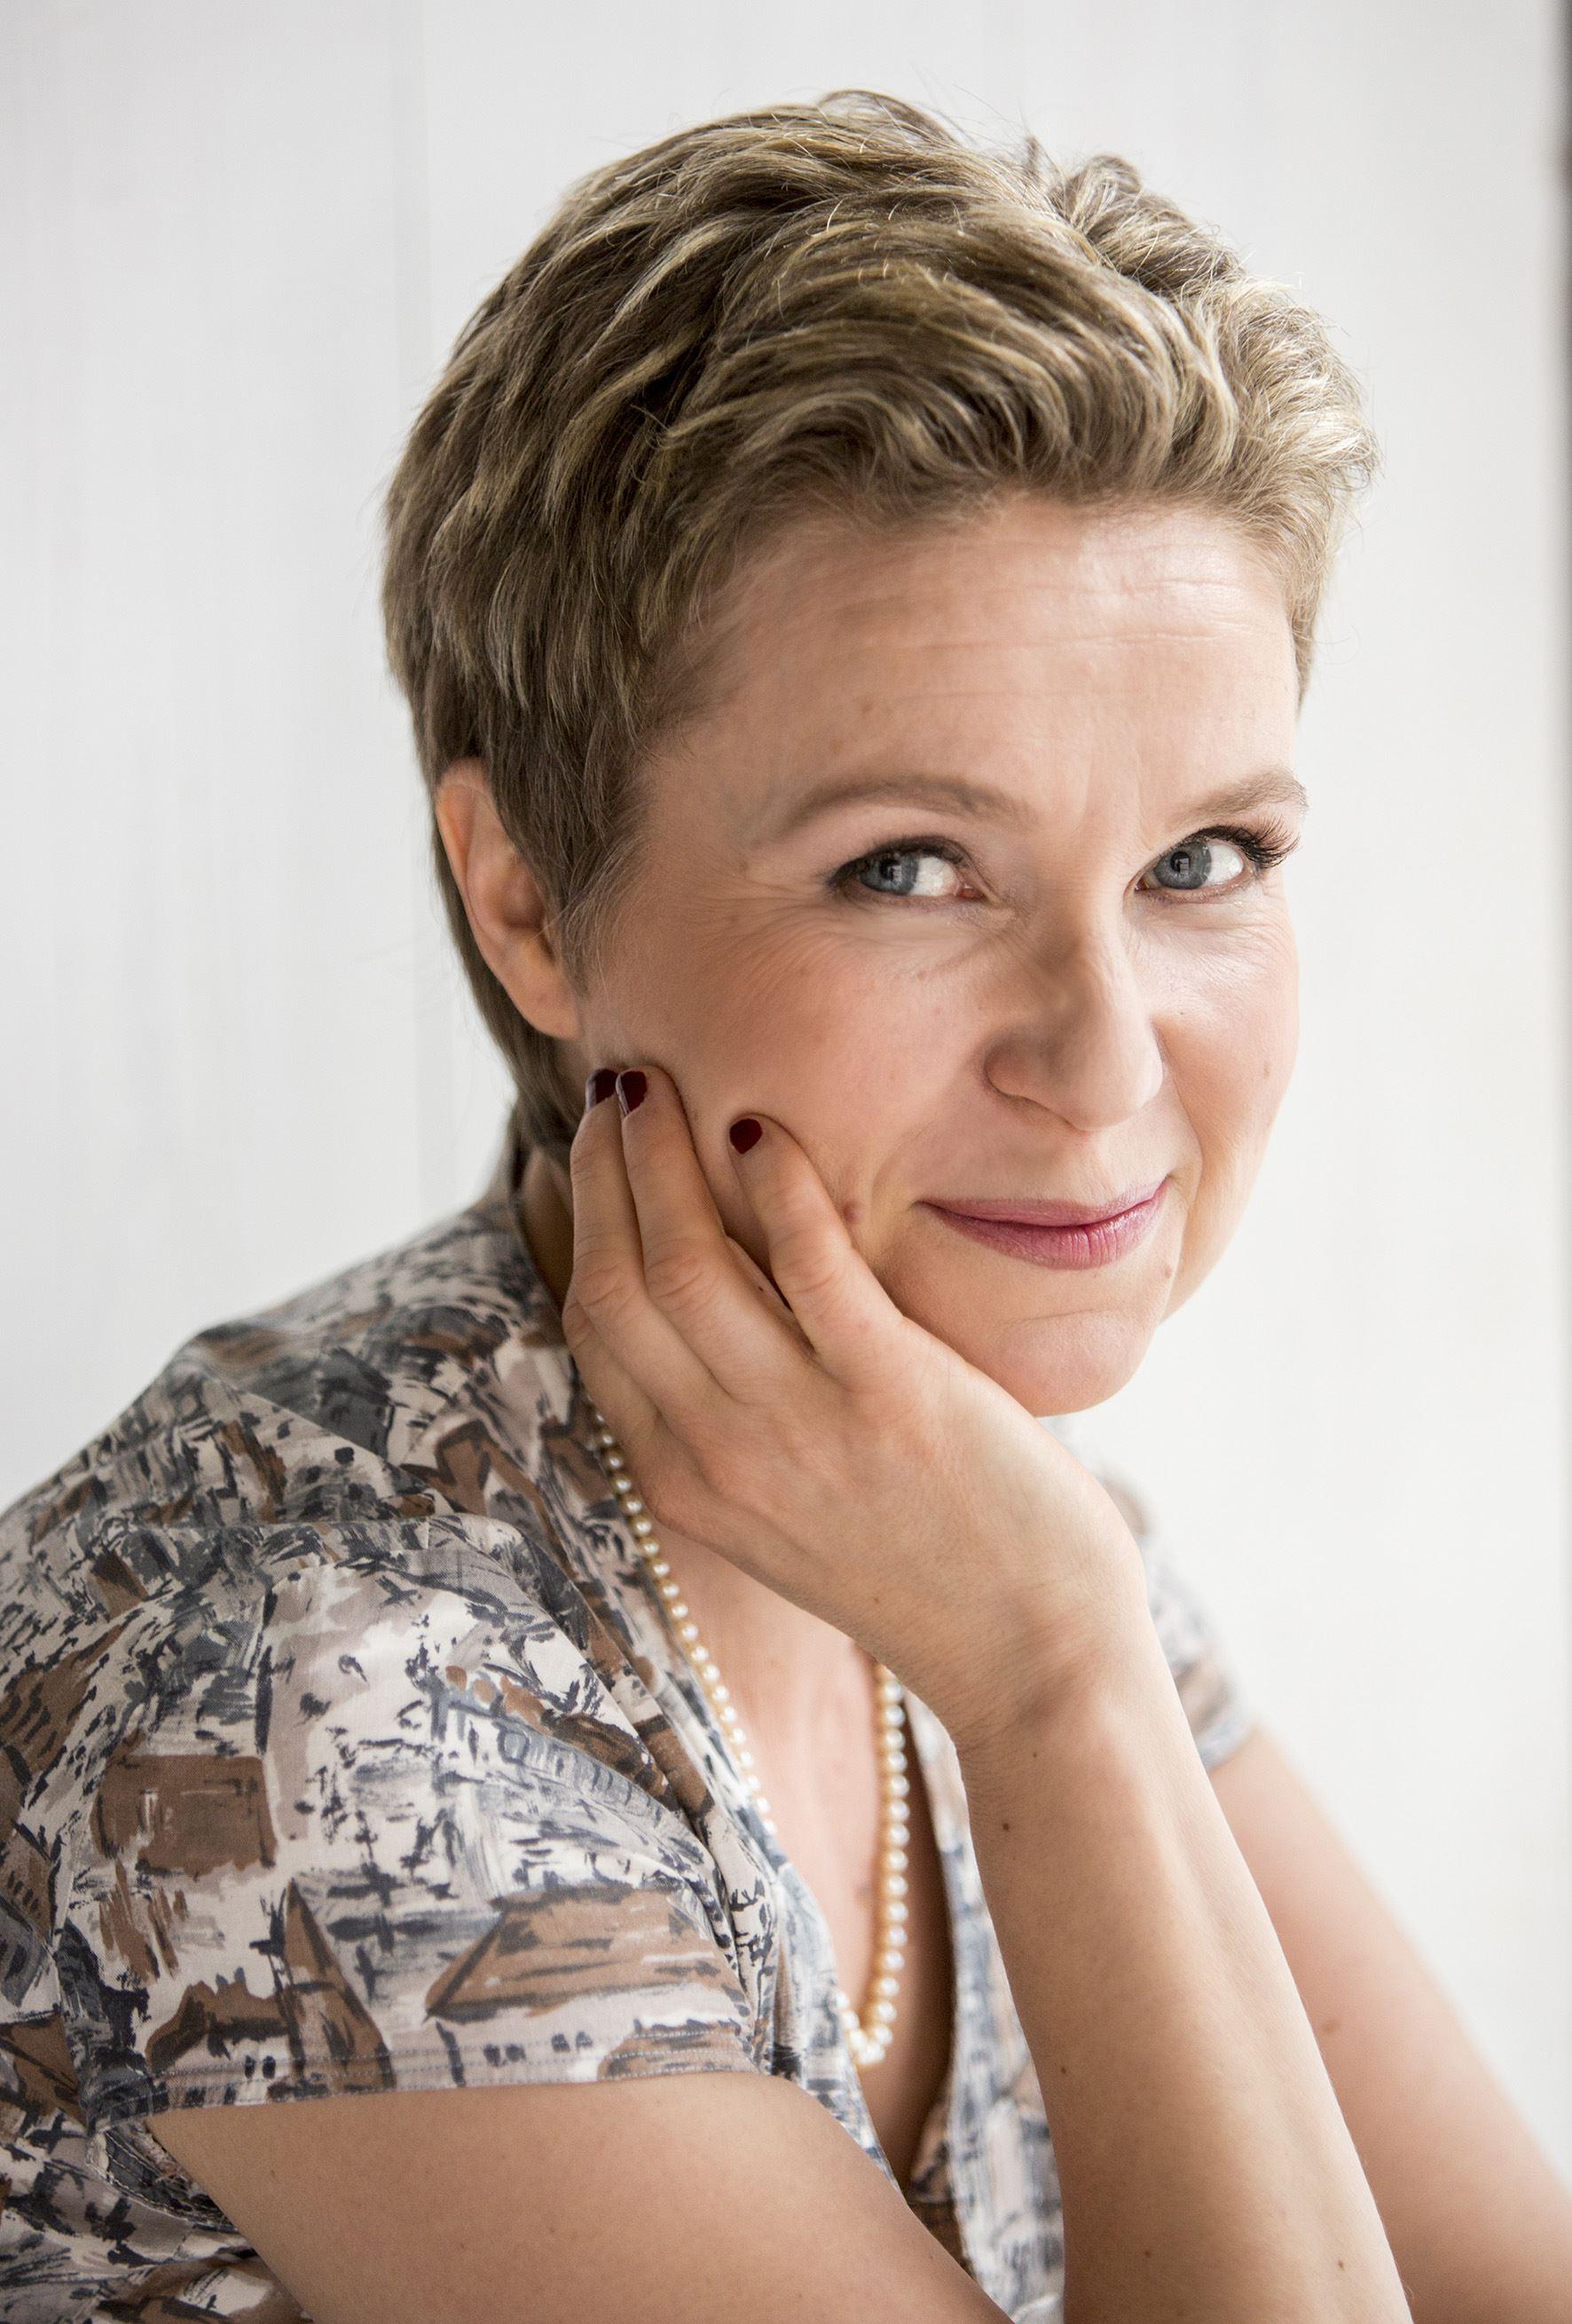 Tommi-Tuomi, Otava, Författarafton med Sirpa Kähkönen